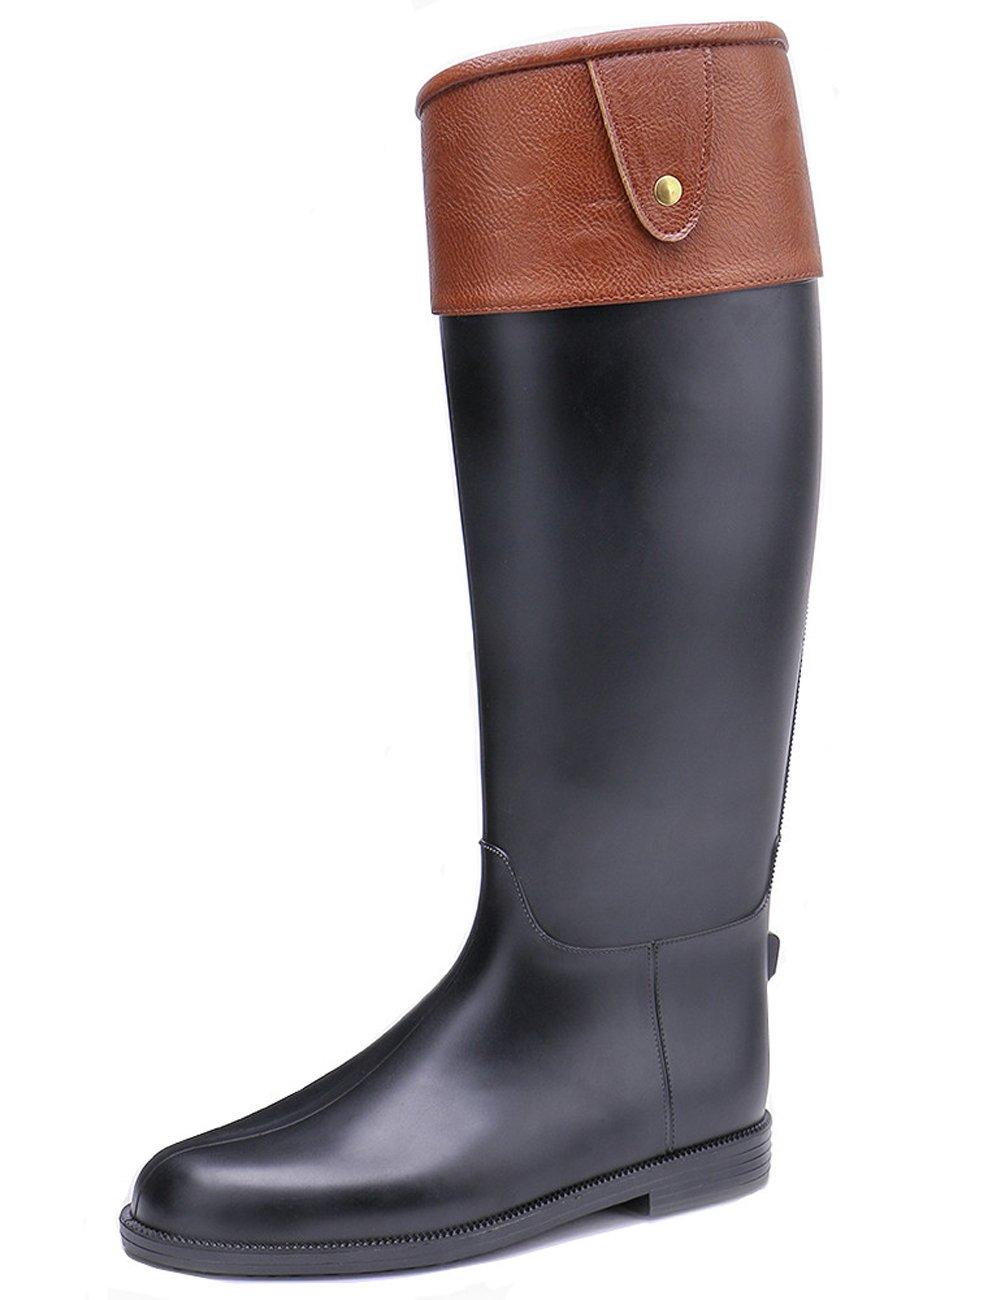 TONGPU Tall Knee-high PU Leather Wrap Rain Boot Zipper Style US 9